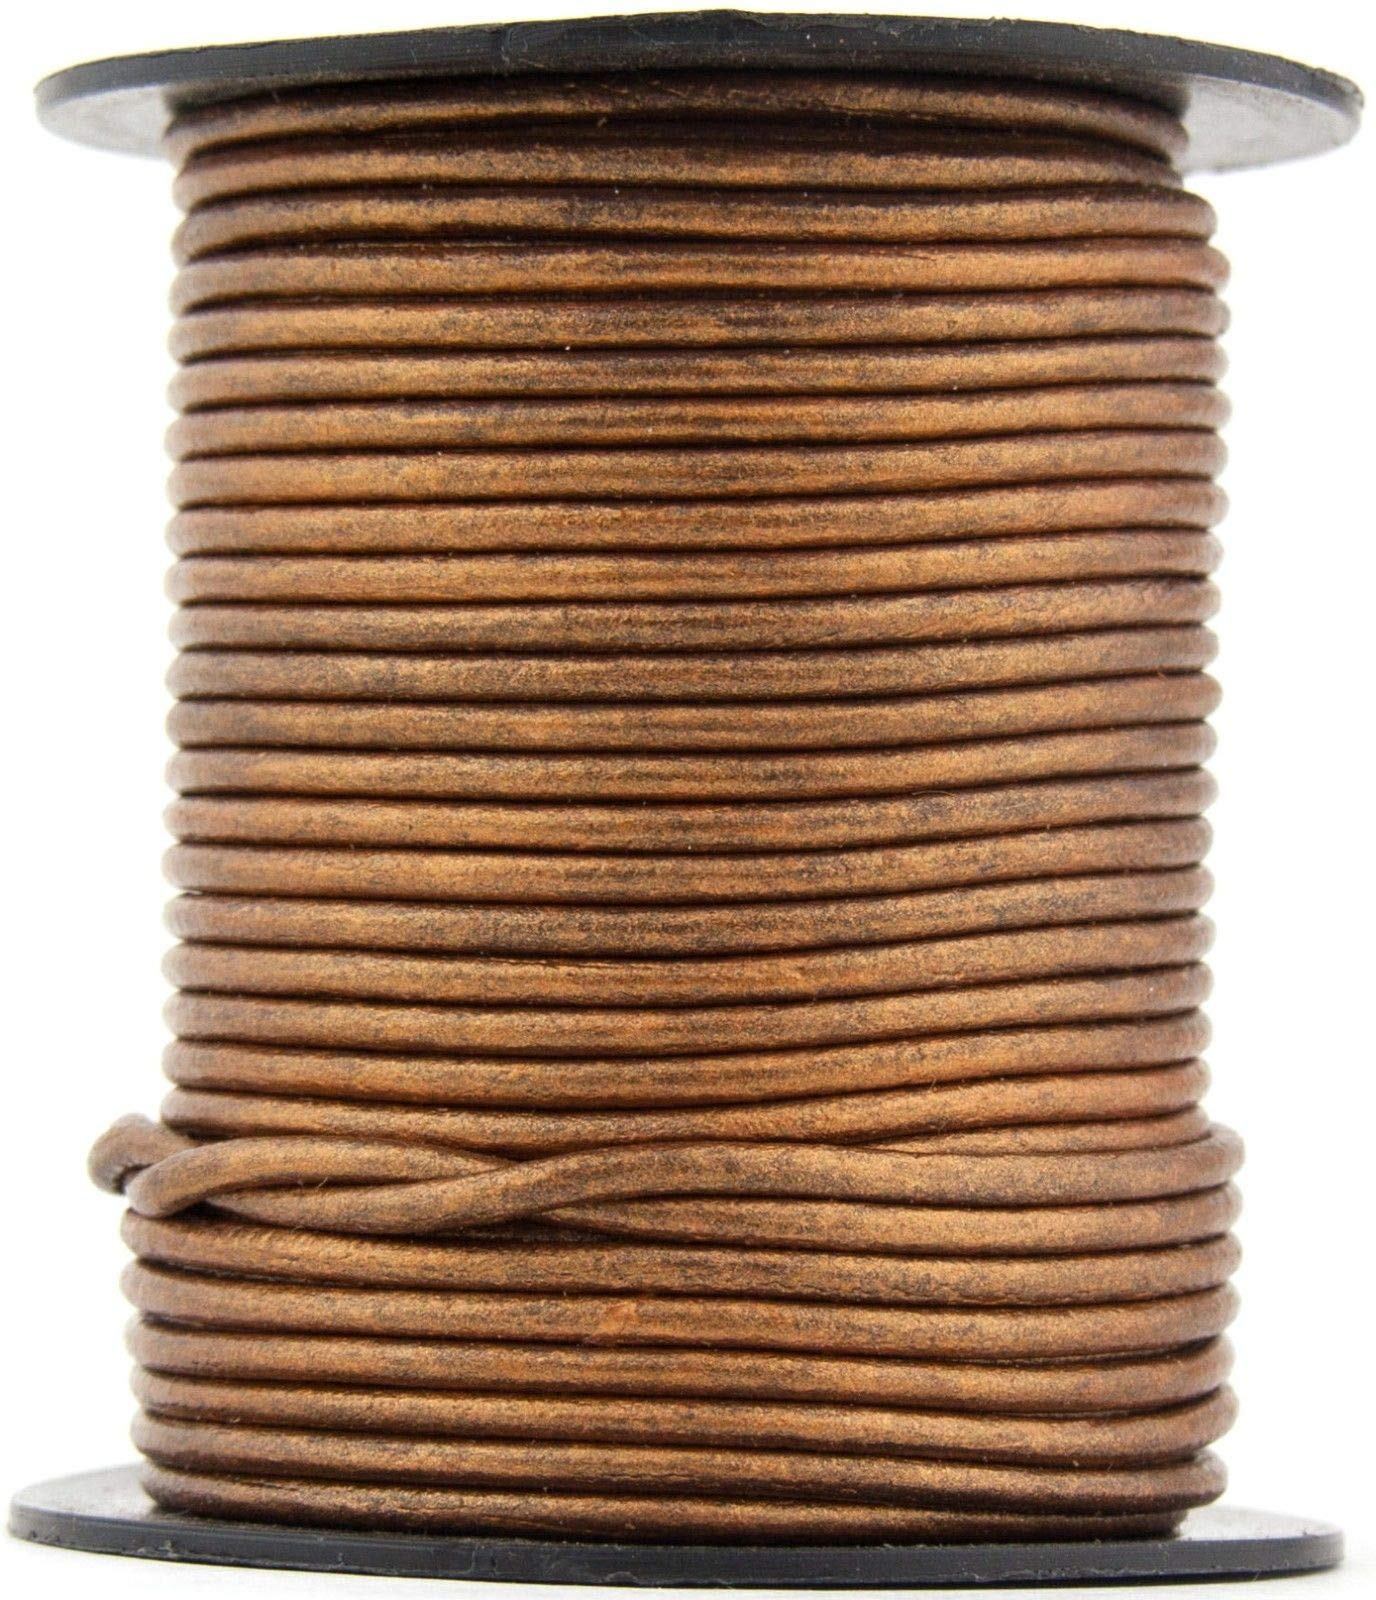 Bronze Metallic Round Leather Cord 1mm 100 Meters (109 Yards)